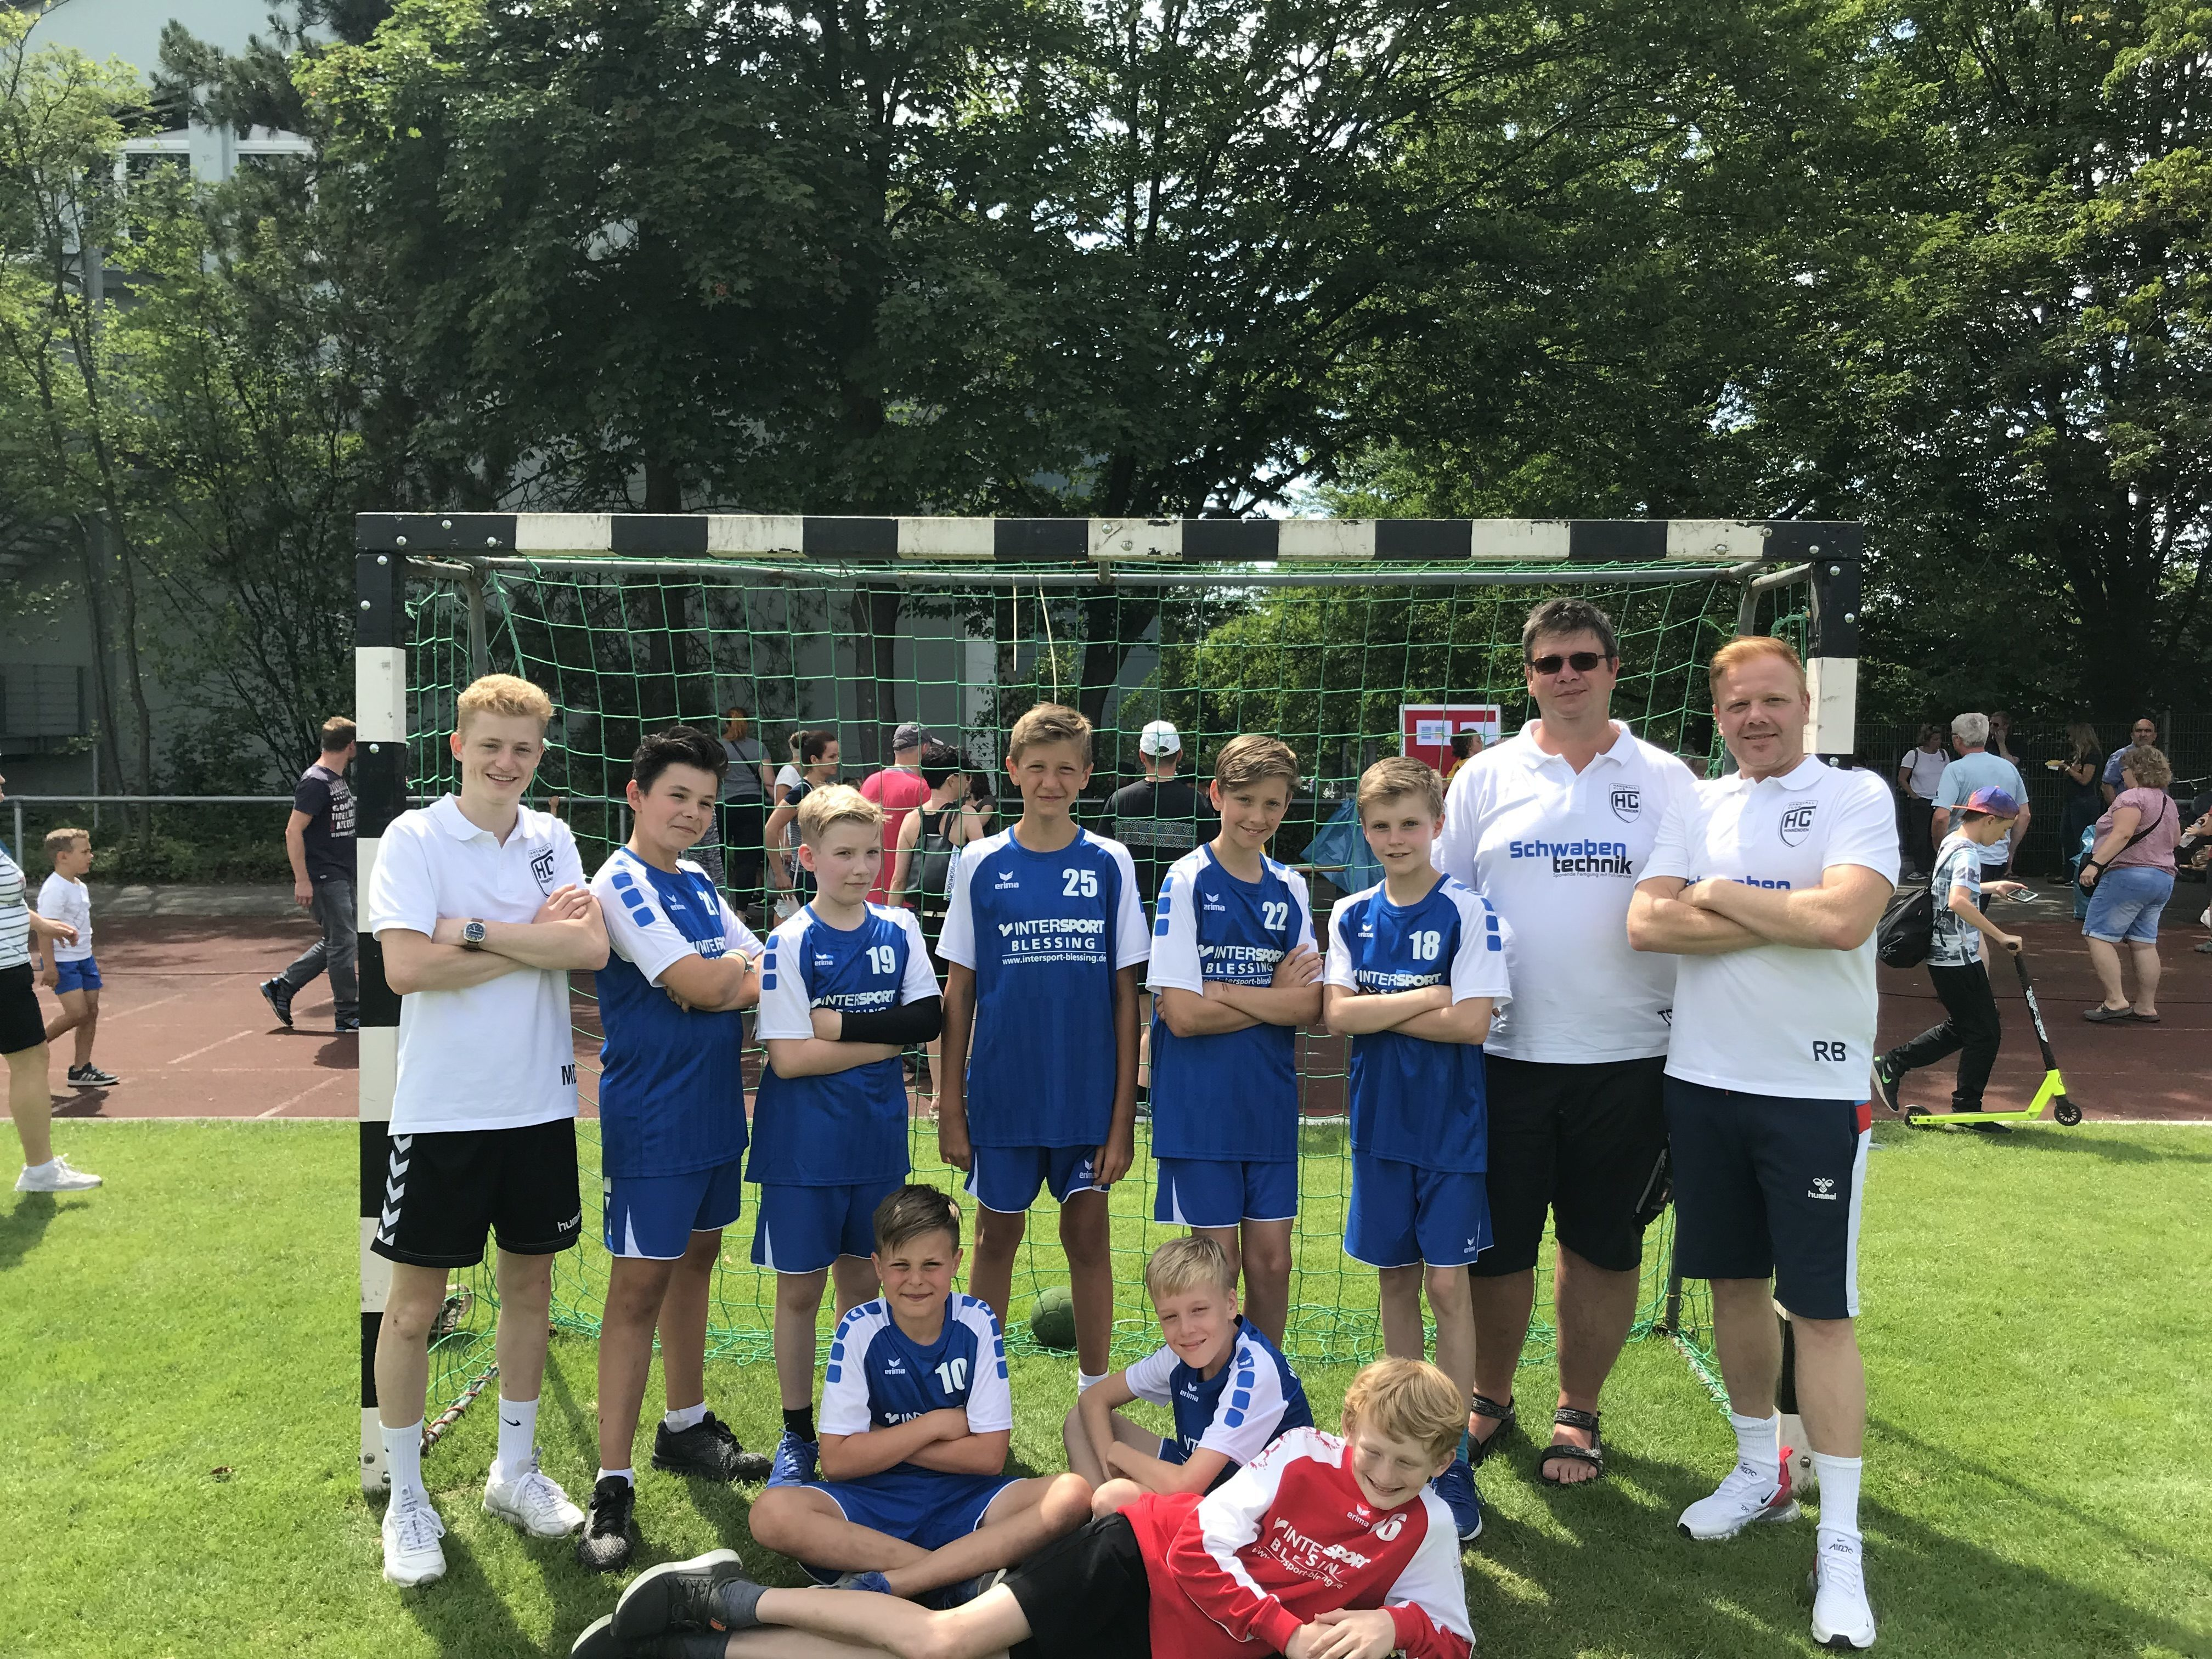 Bericht D-Jugend Turnier in Hohenacker 23.06.2019